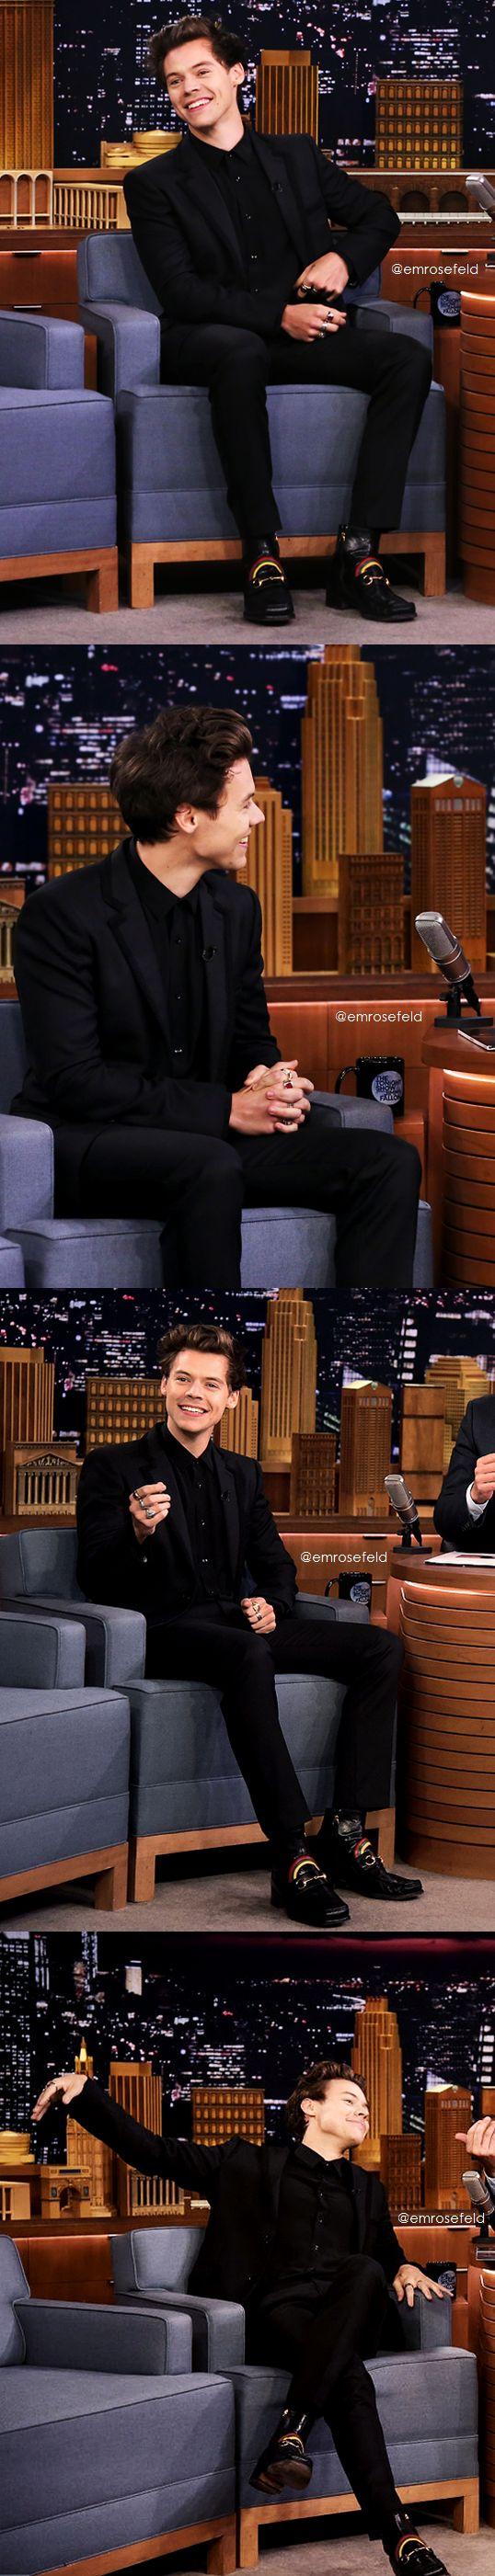 Harry Styles | The Tonight Show 7.19.17 | emrosefeld |